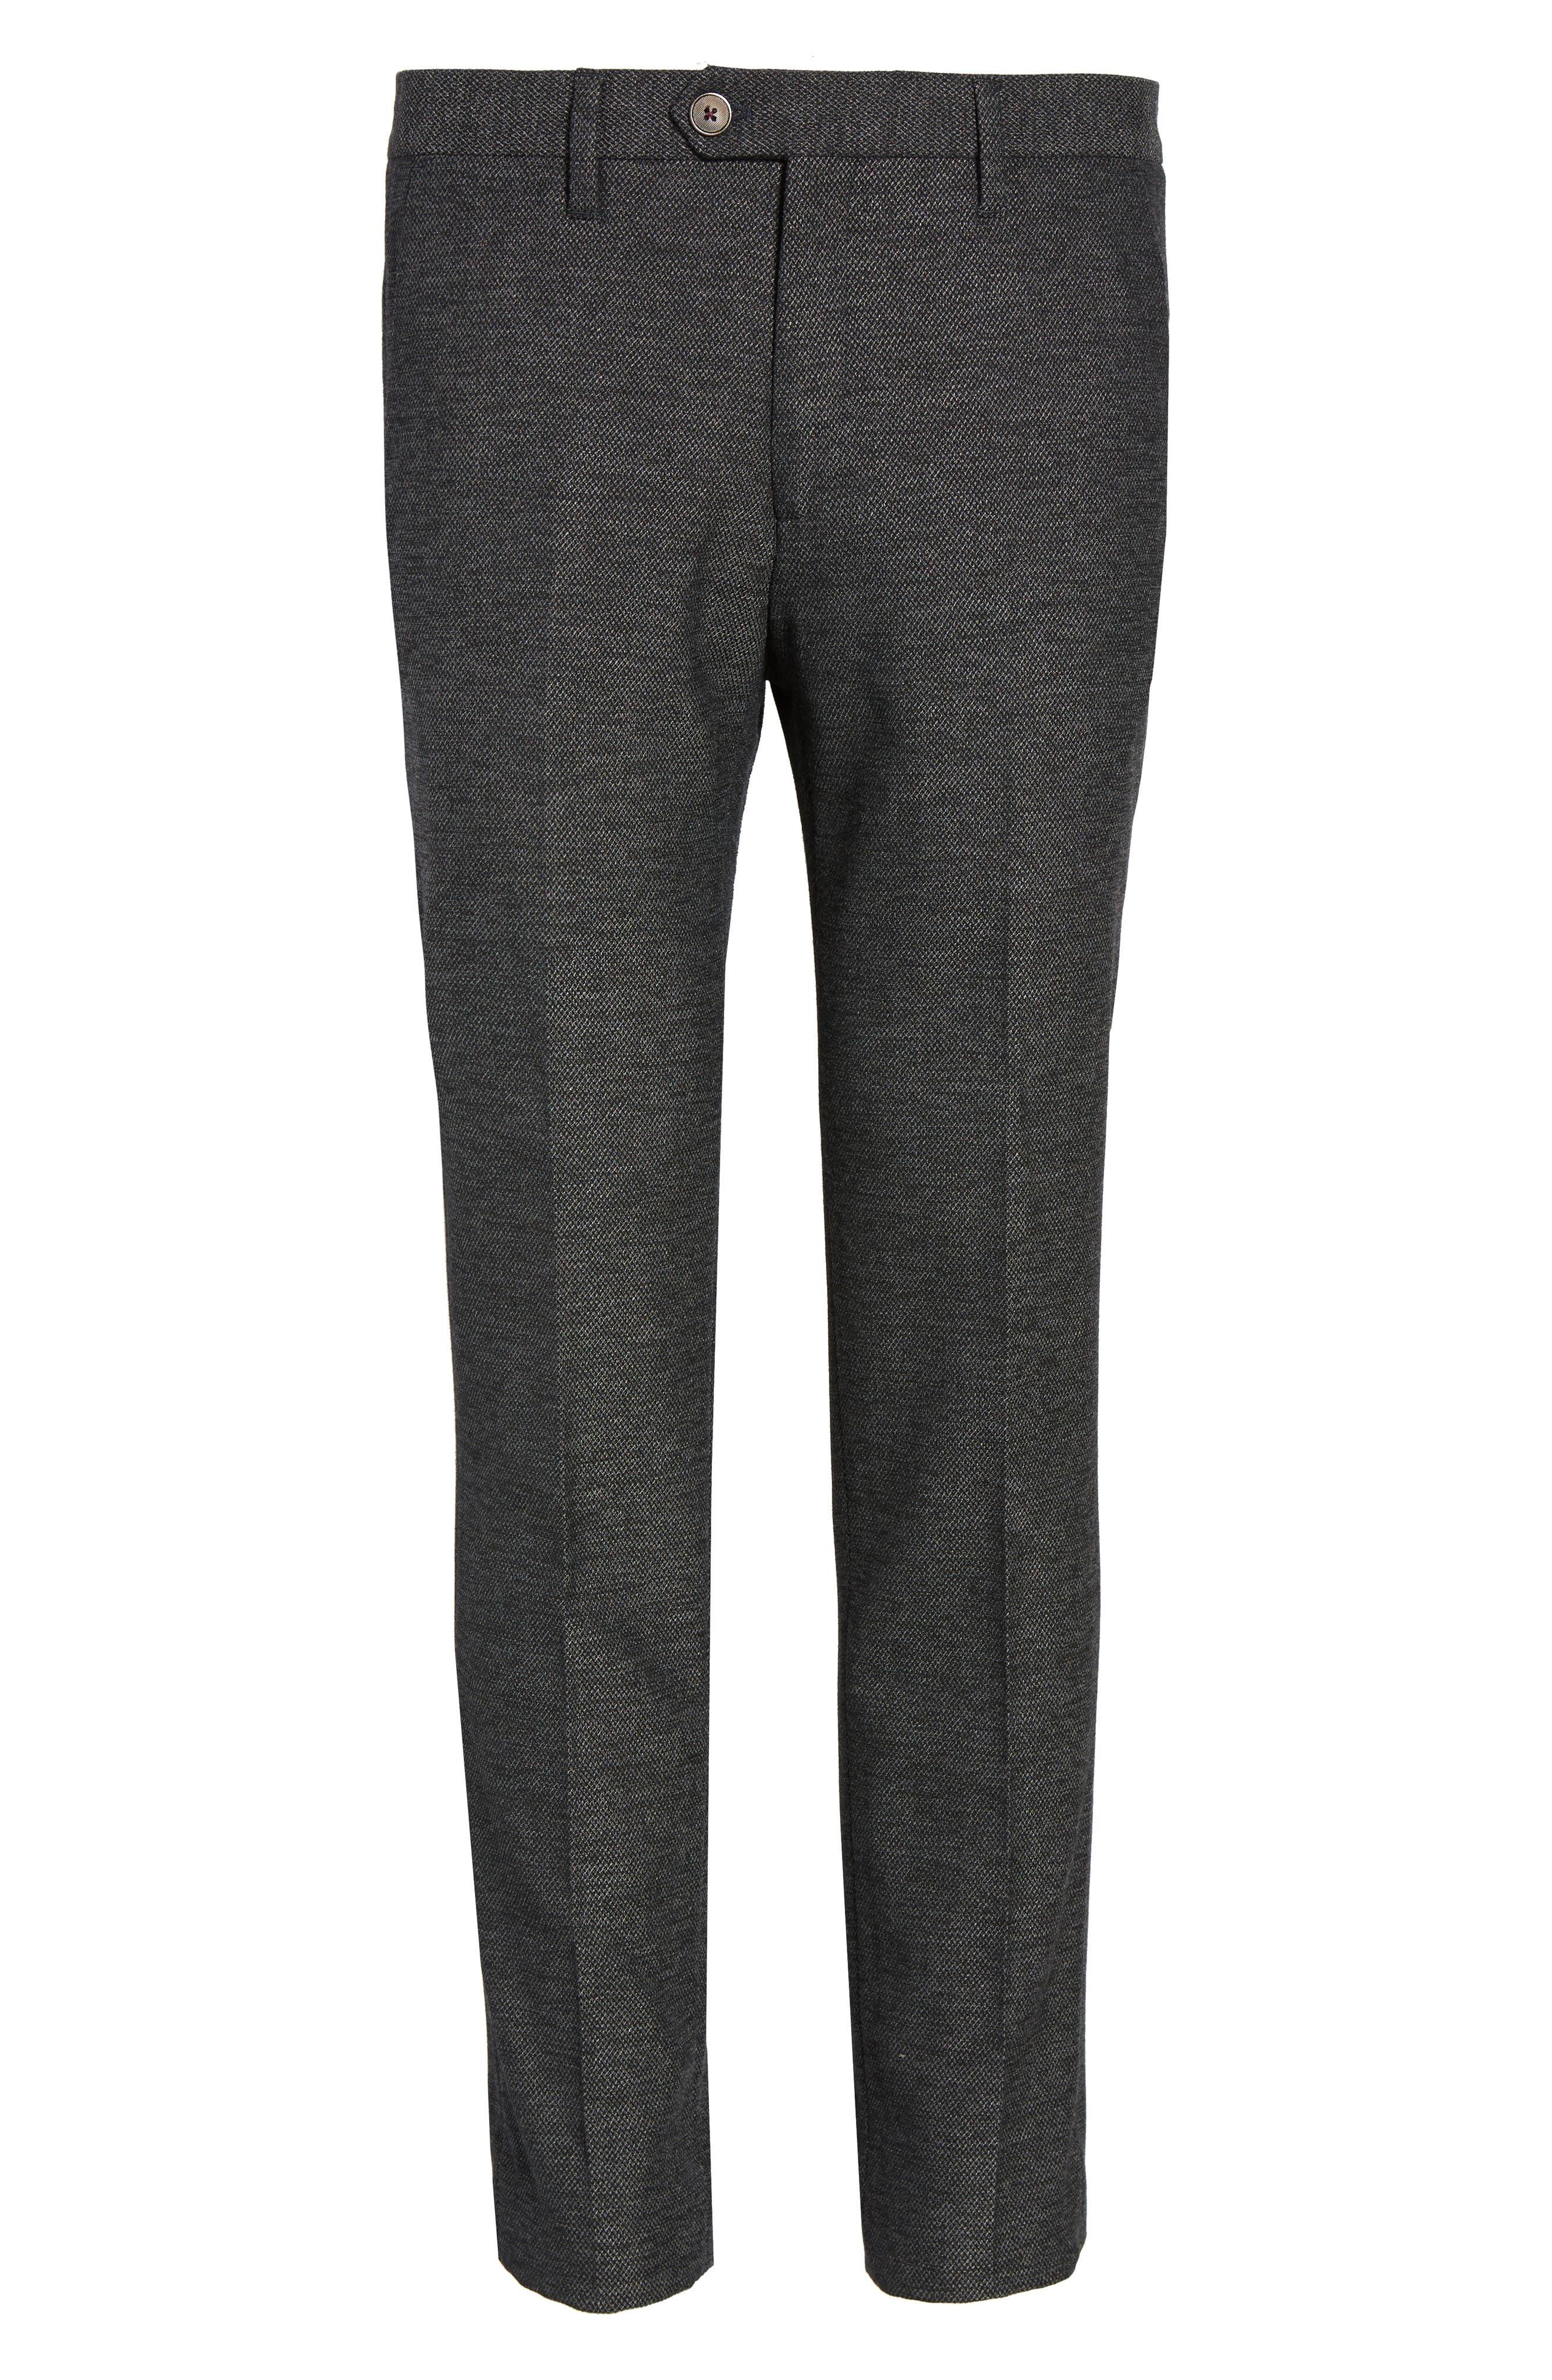 Porttro Modern Slim Fit Trousers,                             Alternate thumbnail 6, color,                             010